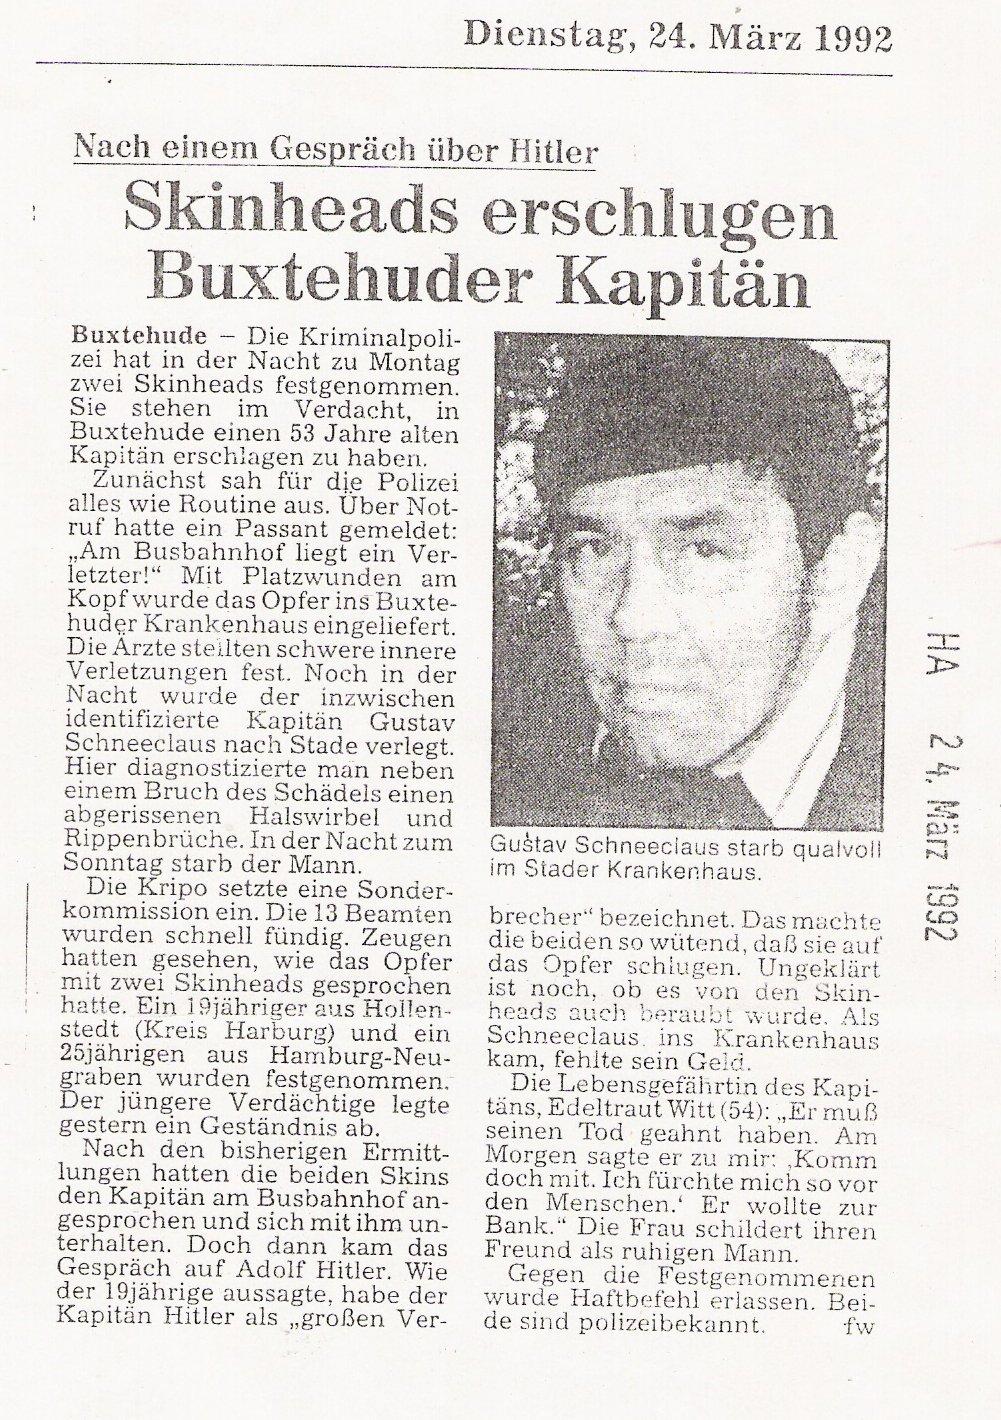 Hamburger Abendblatt2 24.03.1992